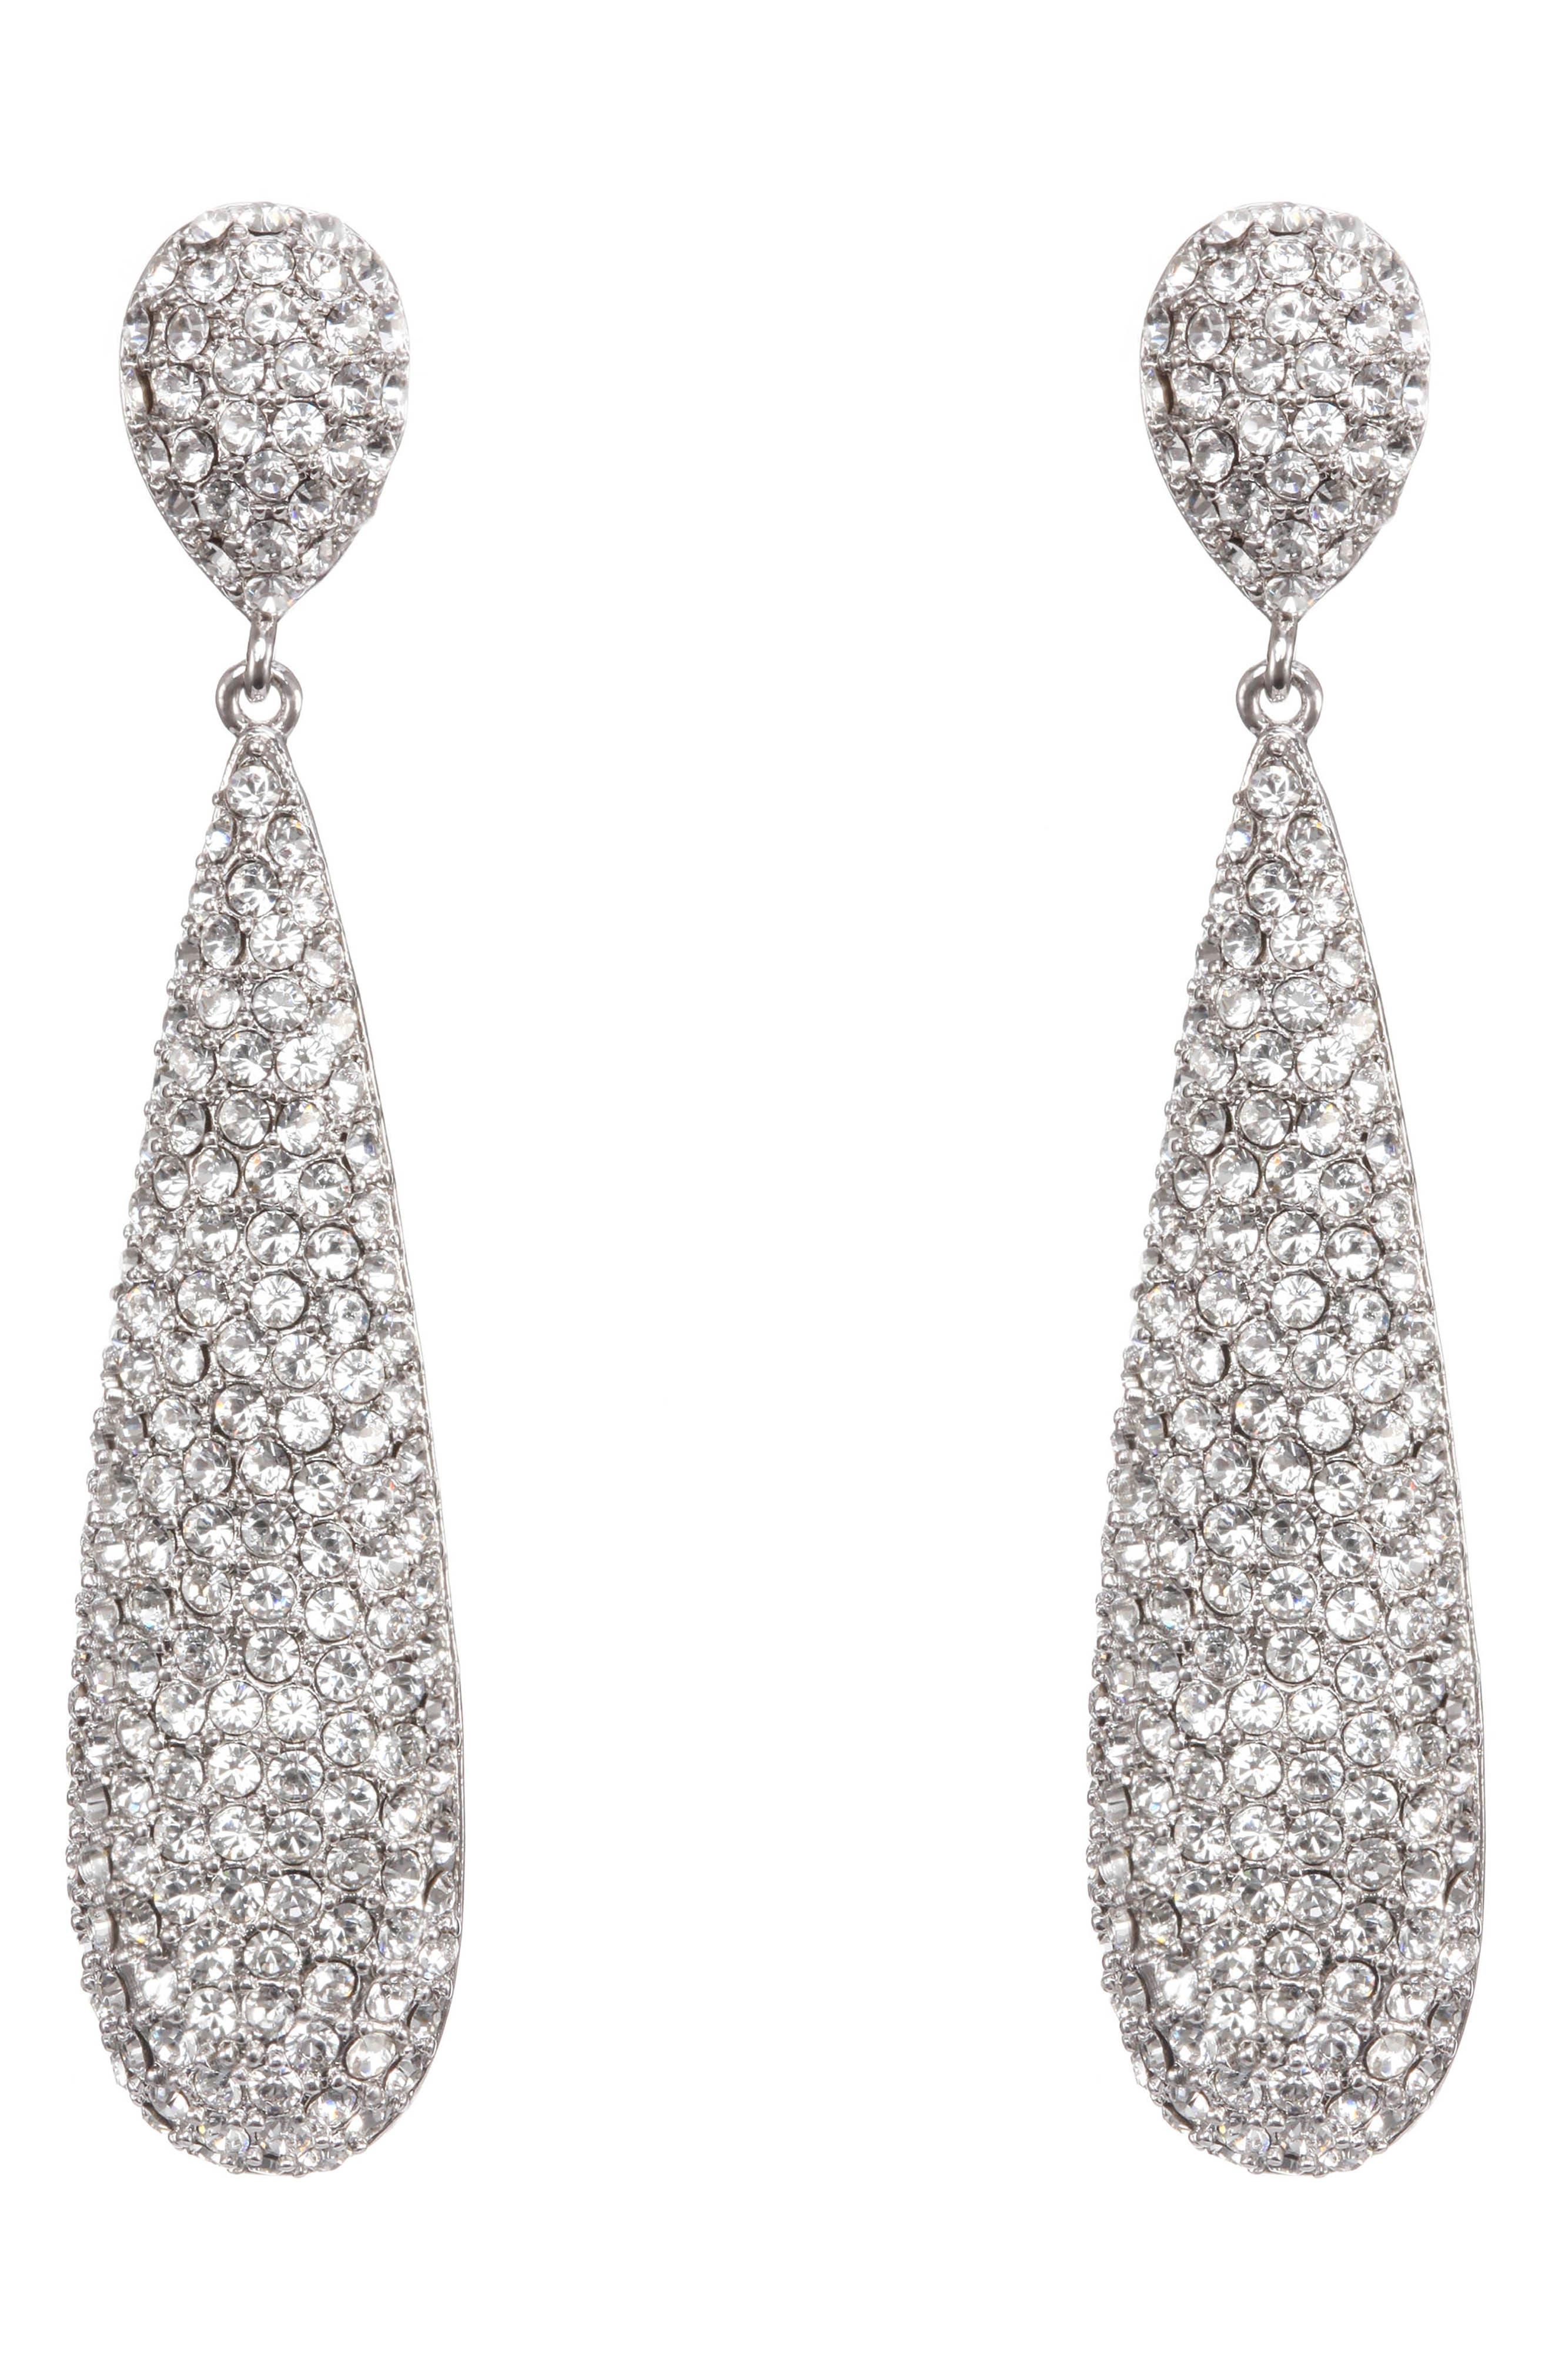 NINA, Elongated Pavé Swarovski Crystal Teardrop Earrings, Main thumbnail 1, color, WHITE/ SILVER